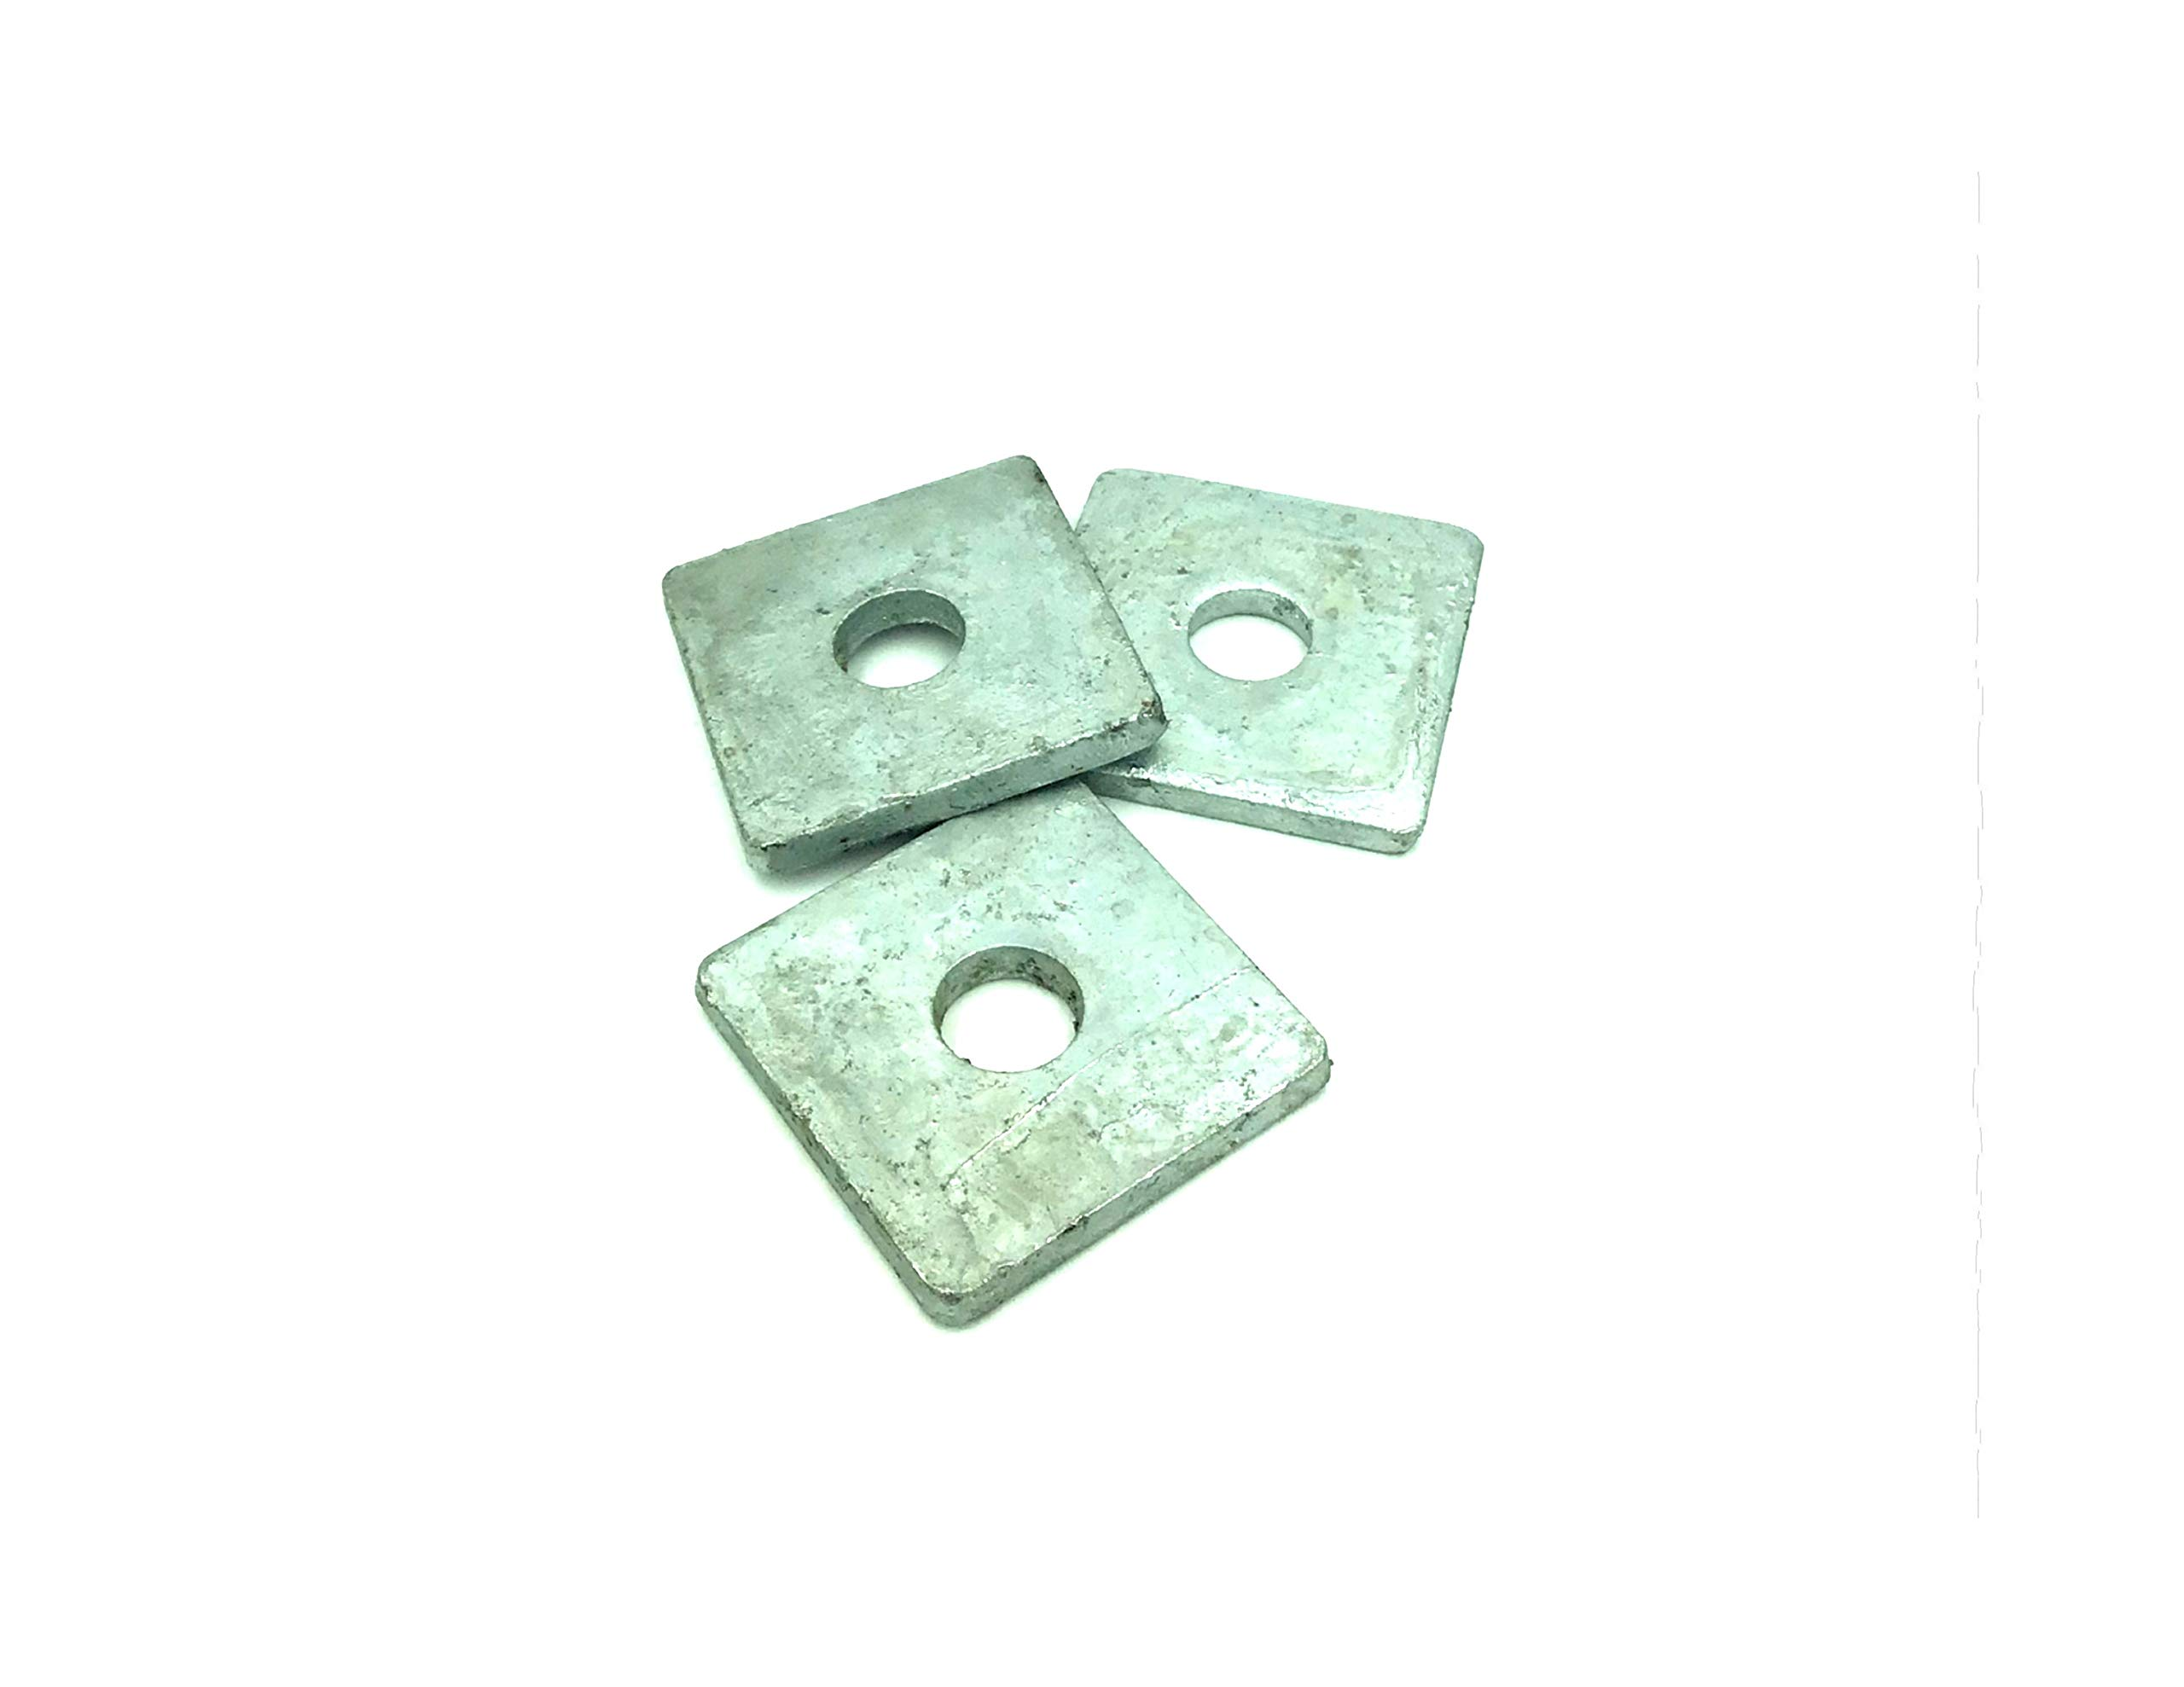 3/4'' x 2-3/4'' x 2-3/4'' x 5/16'' Square Washer Galvanized(15/Pack)